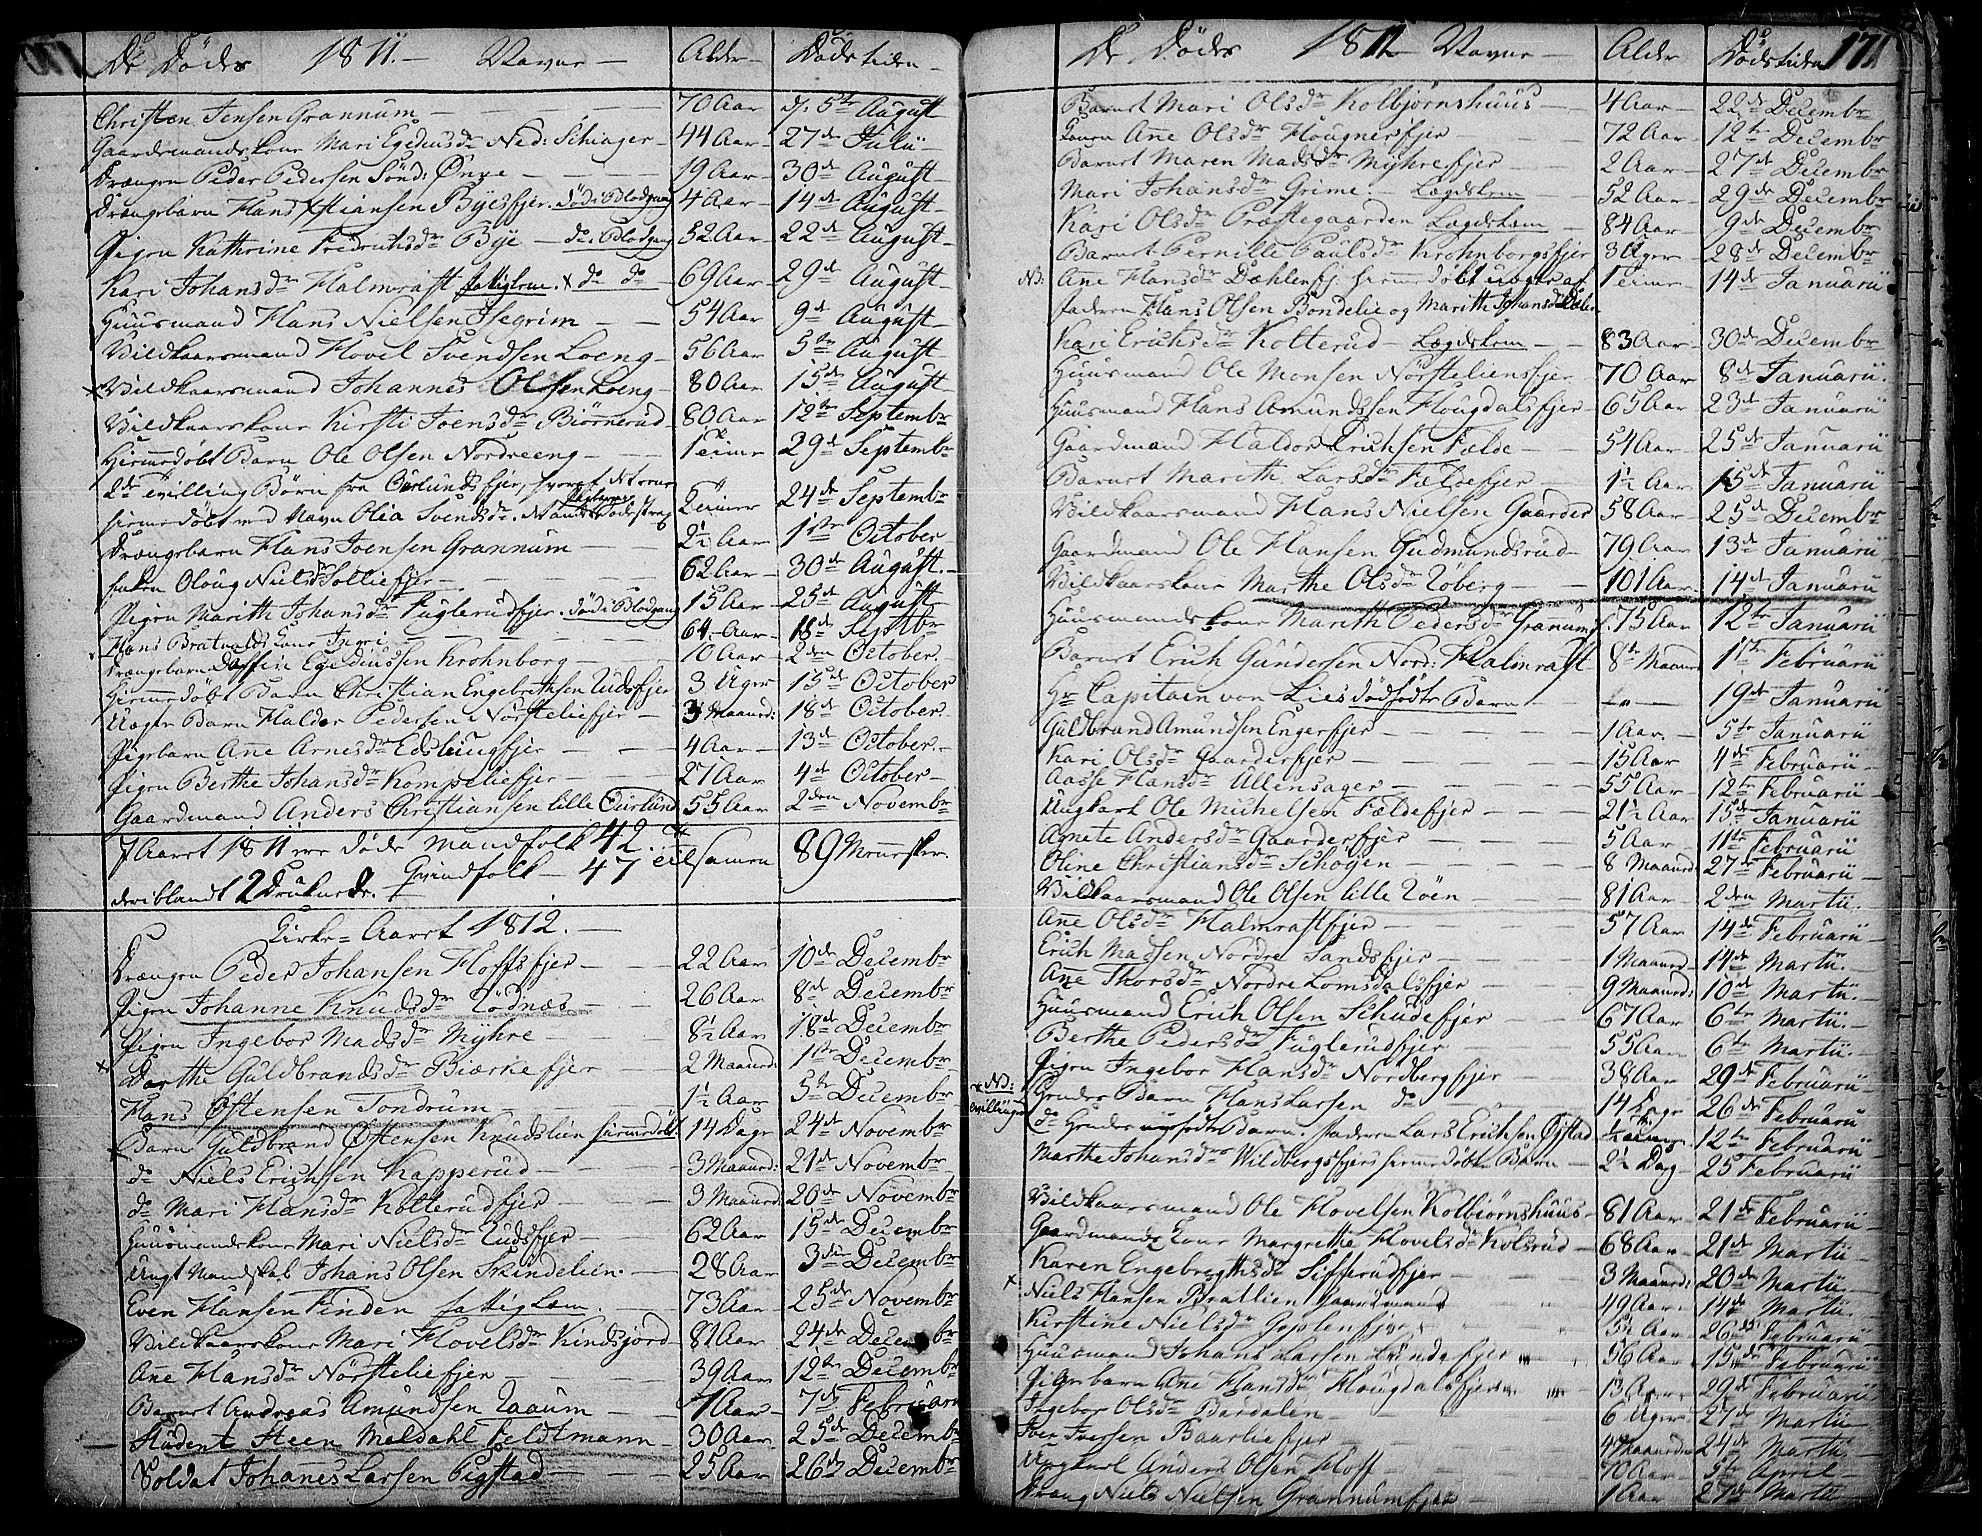 SAH, Land prestekontor, Ministerialbok nr. 6, 1784-1813, s. 171